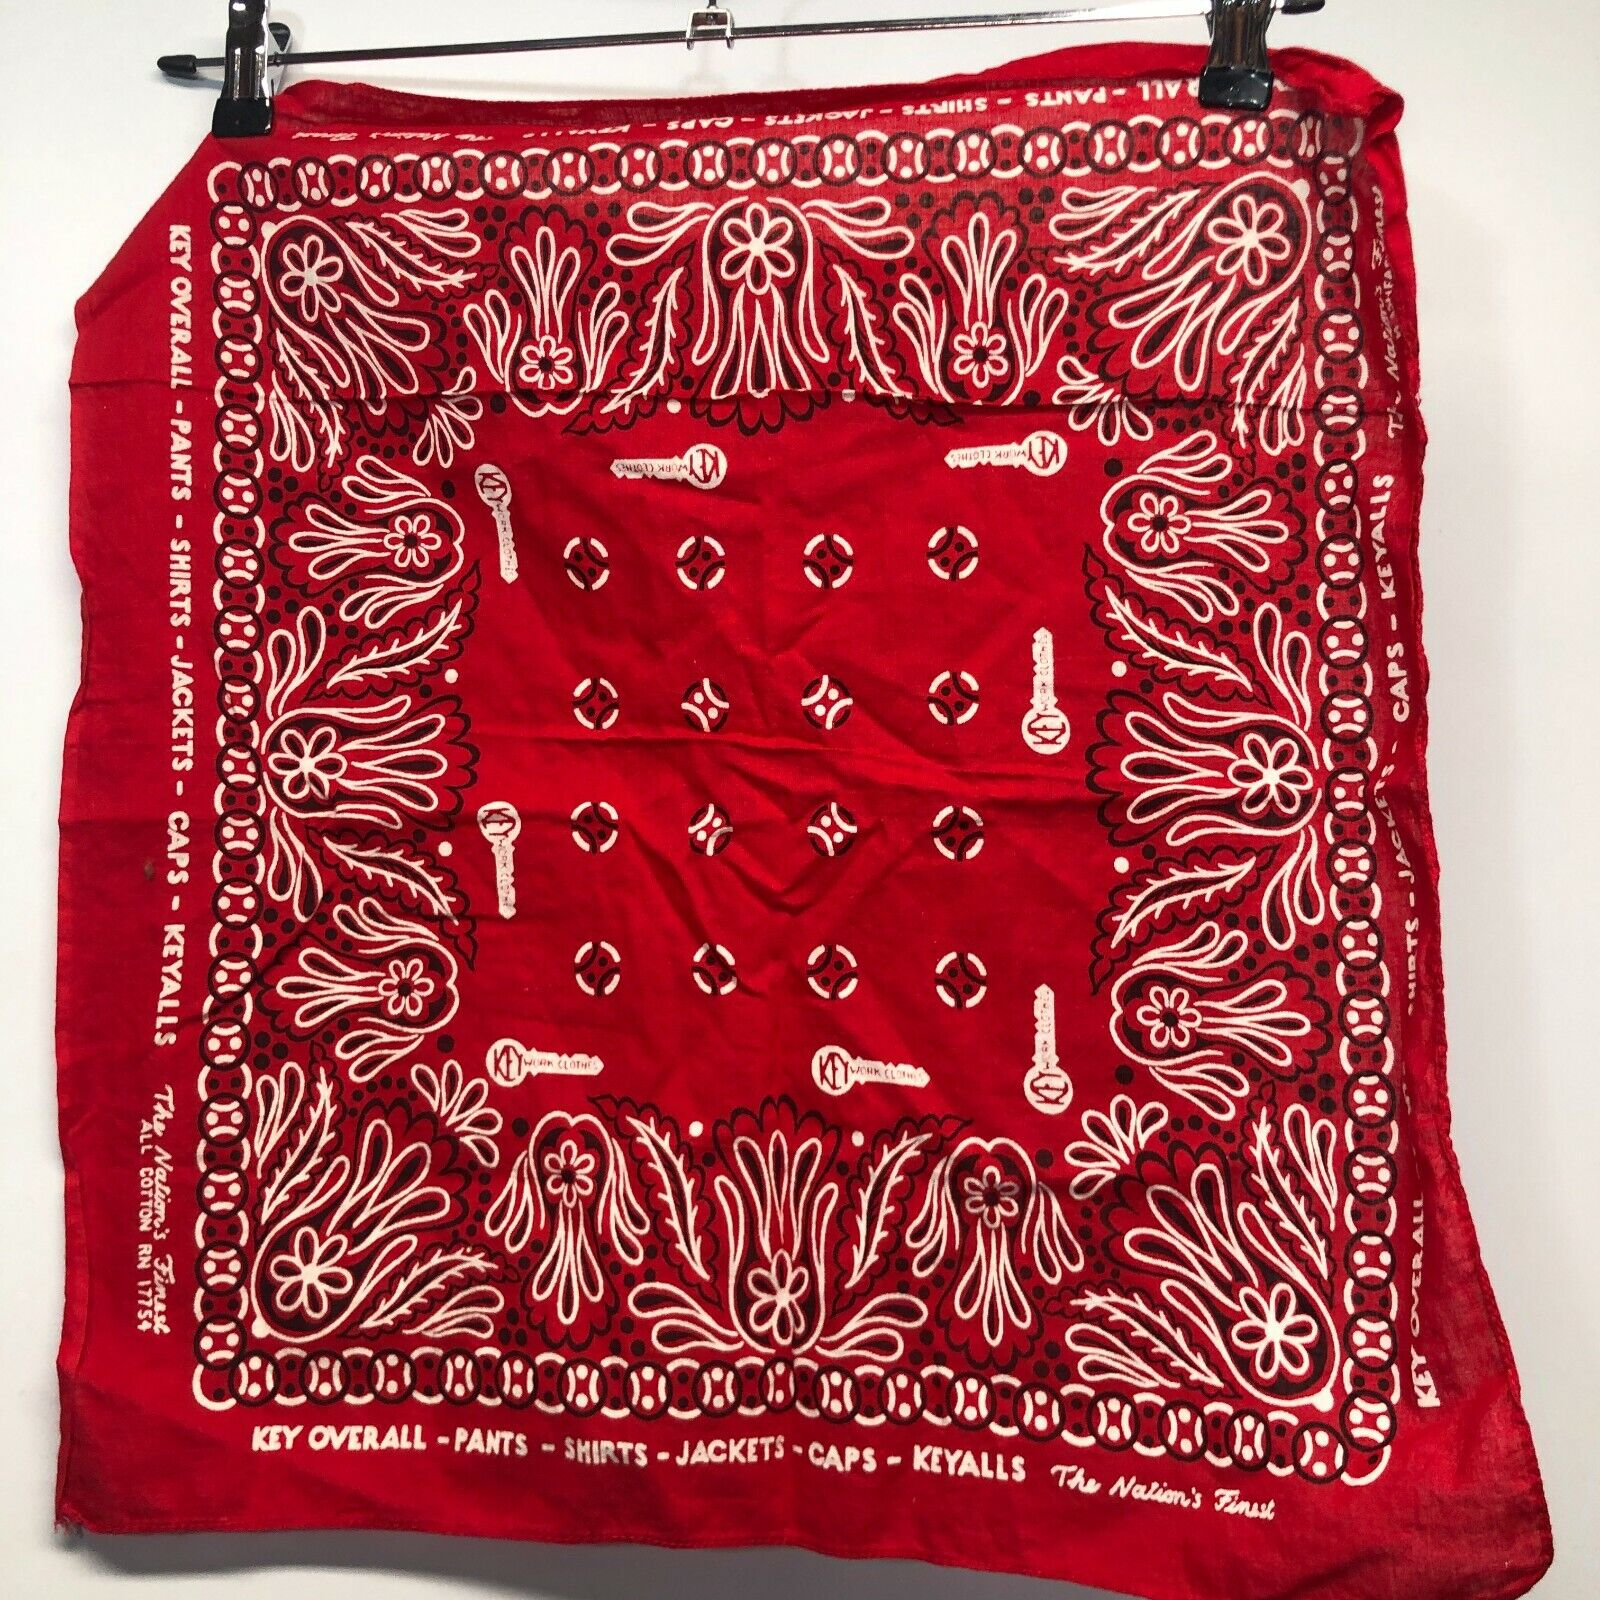 Vintage Key Overalls bandana workwear